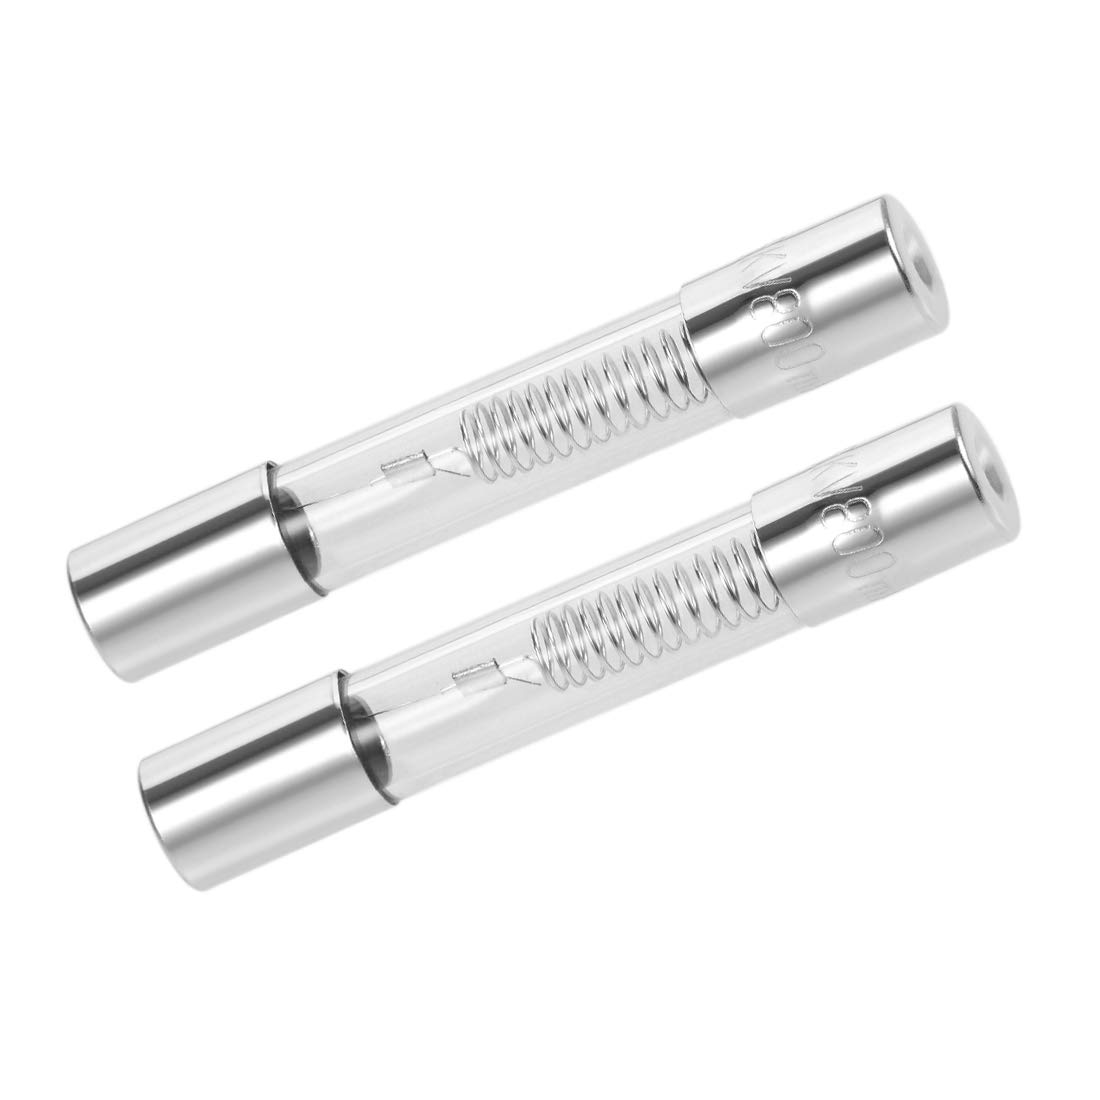 Sourcingmap Slow Blow 0.6A 2pcs fabricados de vidrio soplado lento Fusibles de cartucho para hornos y para microondas de acci/ón lenta de 6 mm x 40 mm de 5000 V